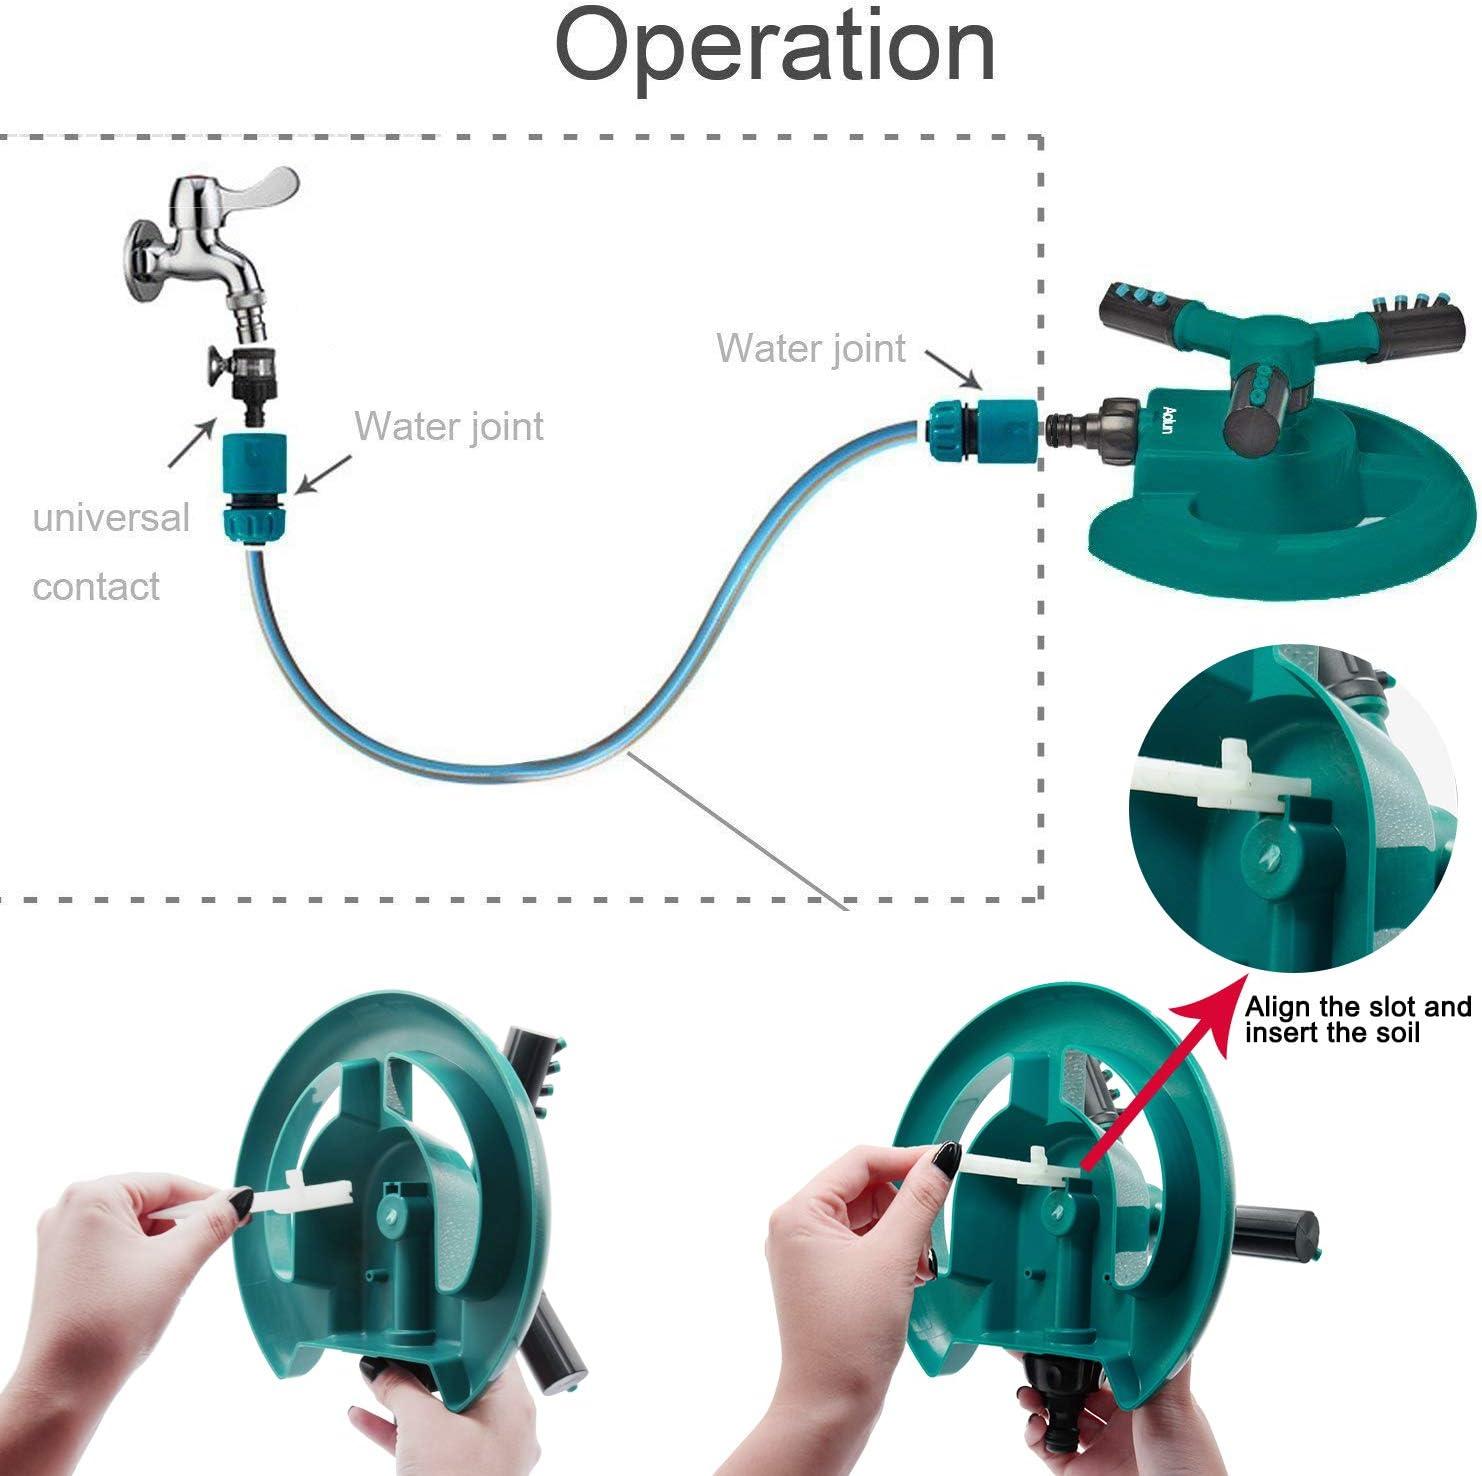 Aolun R108 Garden Sprinkler Arm Rotating Sprinkler System Automatic Lawn Water Sprinkler 360 Degree 3